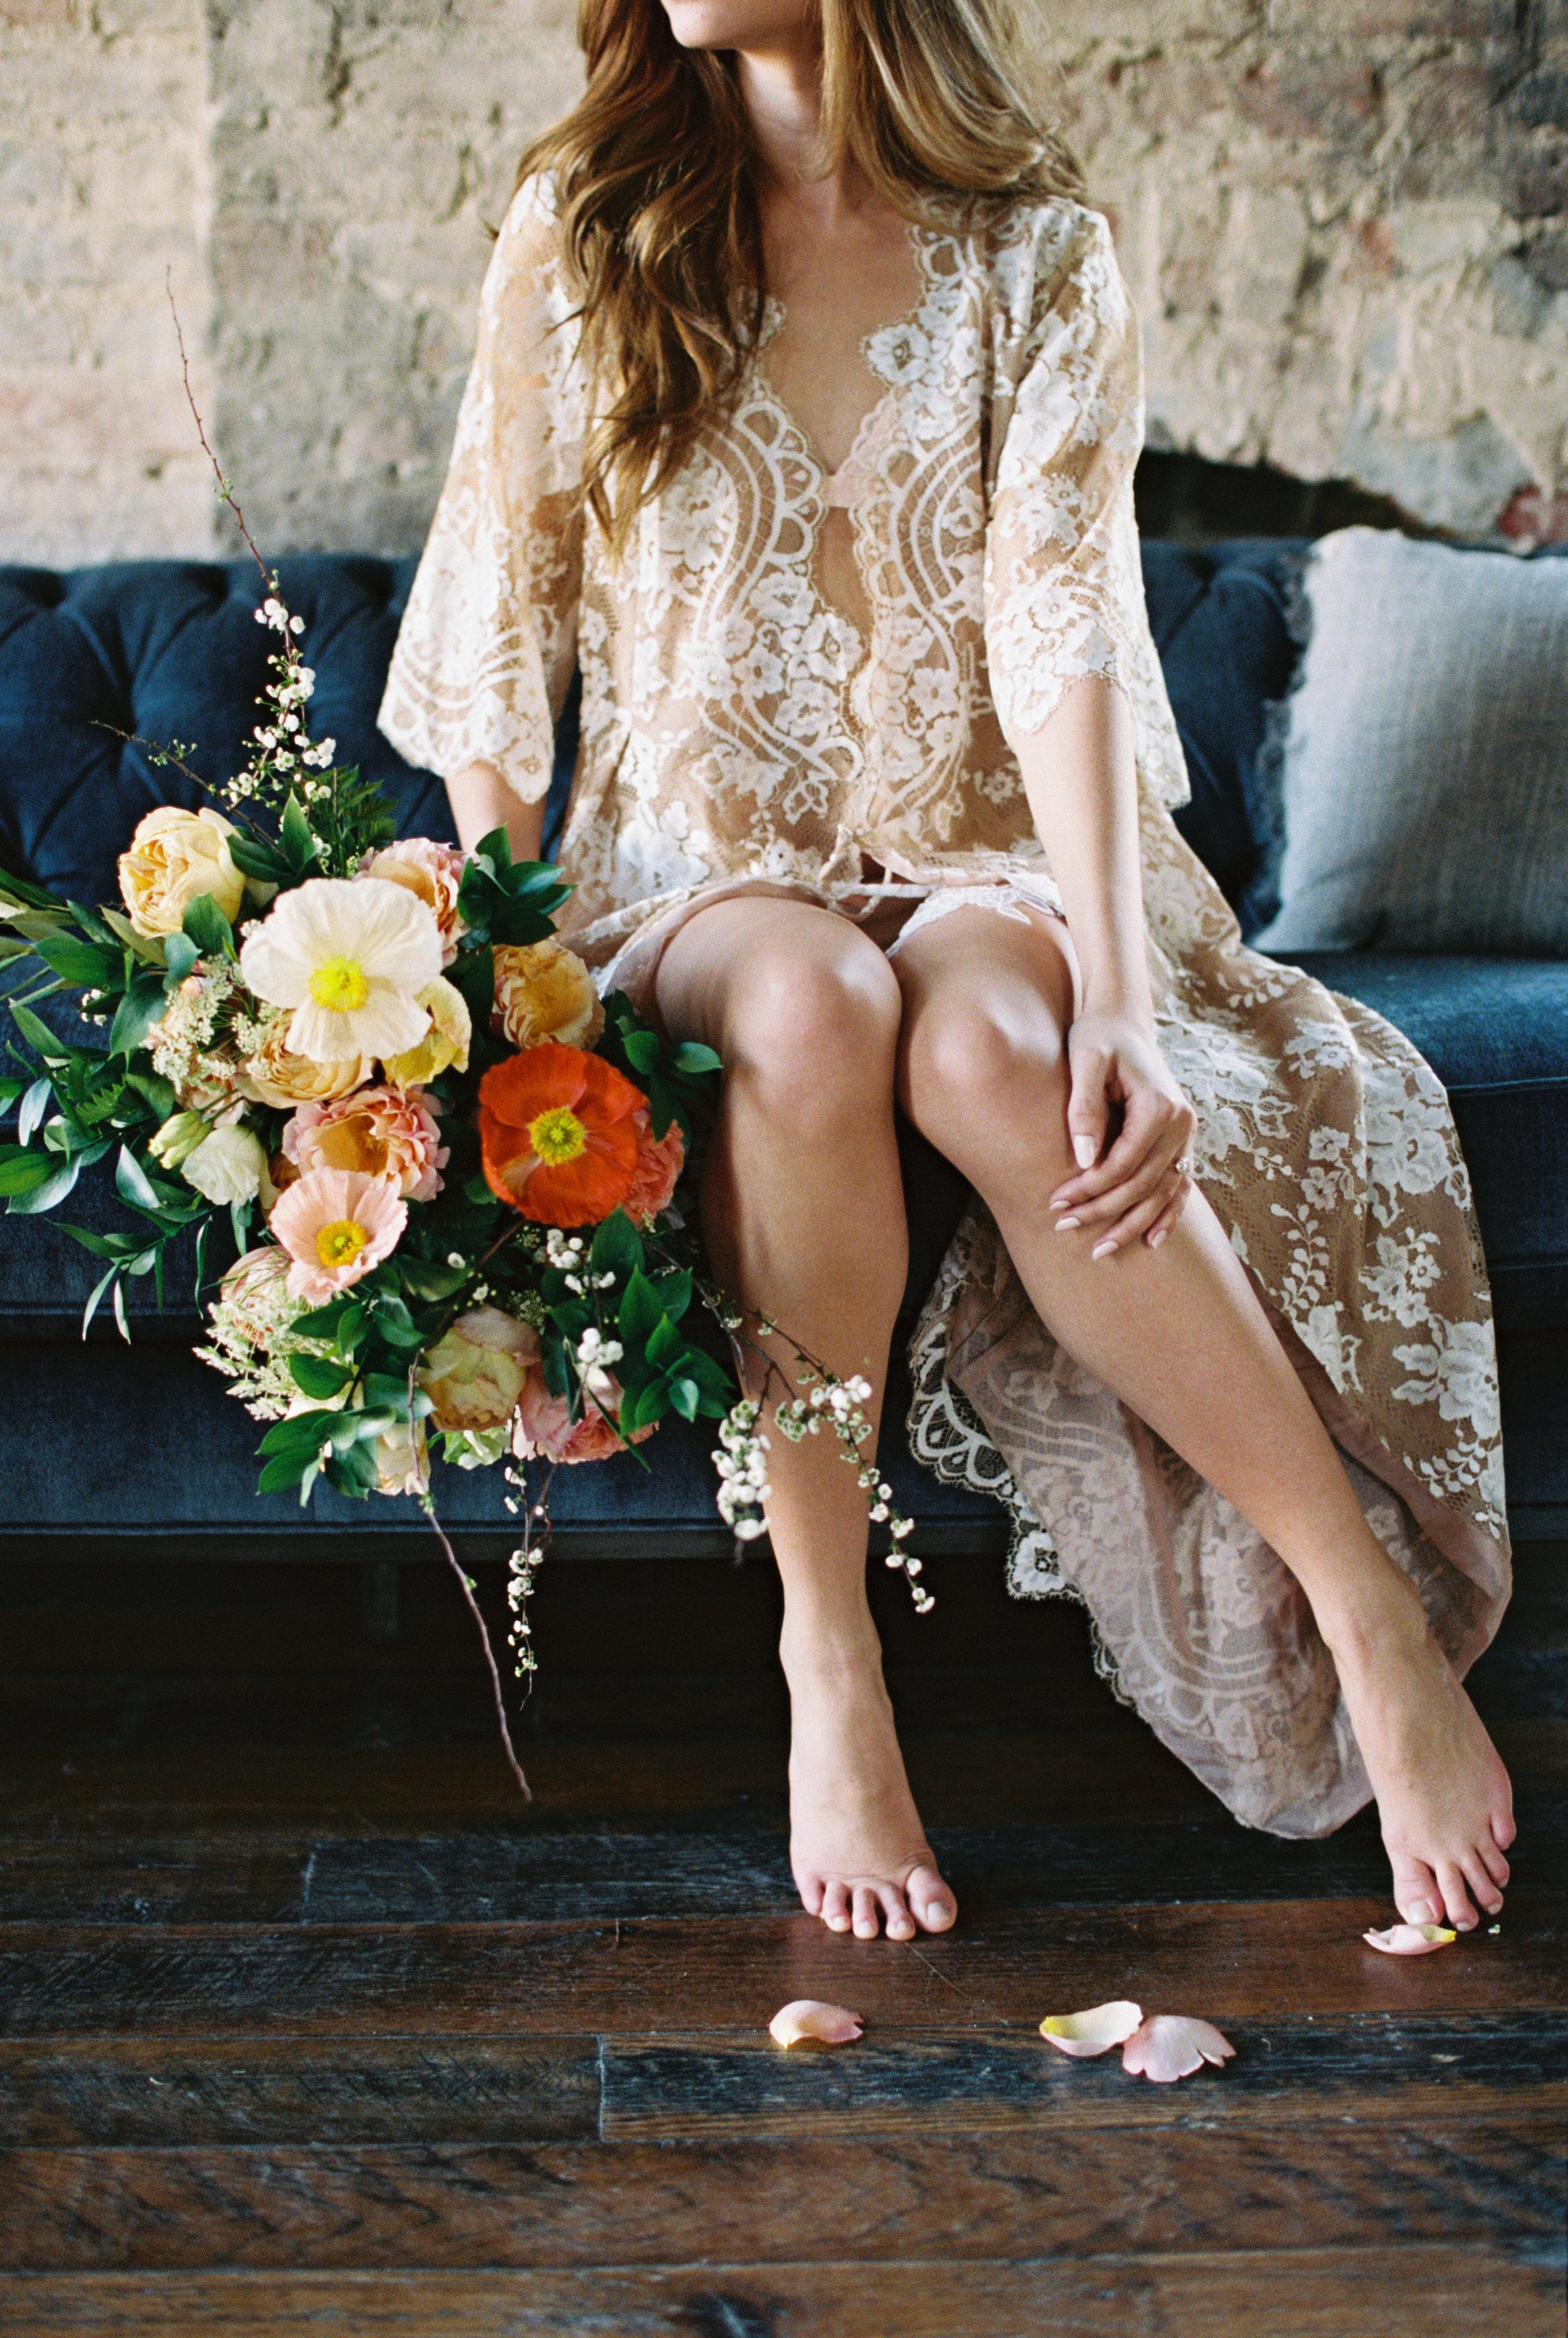 Cordell_Nashville_In_Bloom_Editorial_Boudoir_Abigail_Malone_Photography-74.jpg